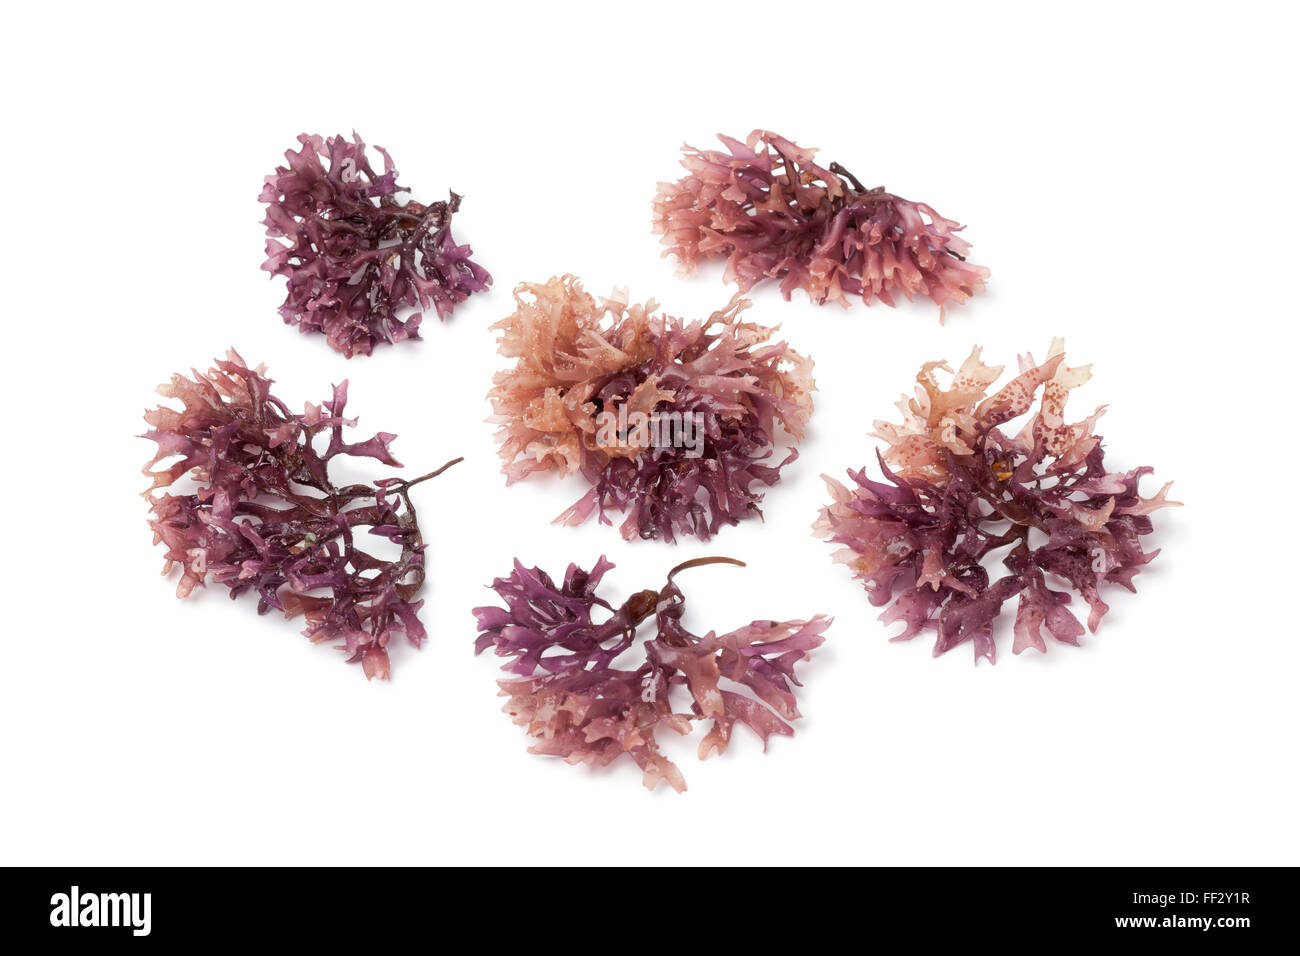 Star shaped moss seaweed on white background - Stock Image